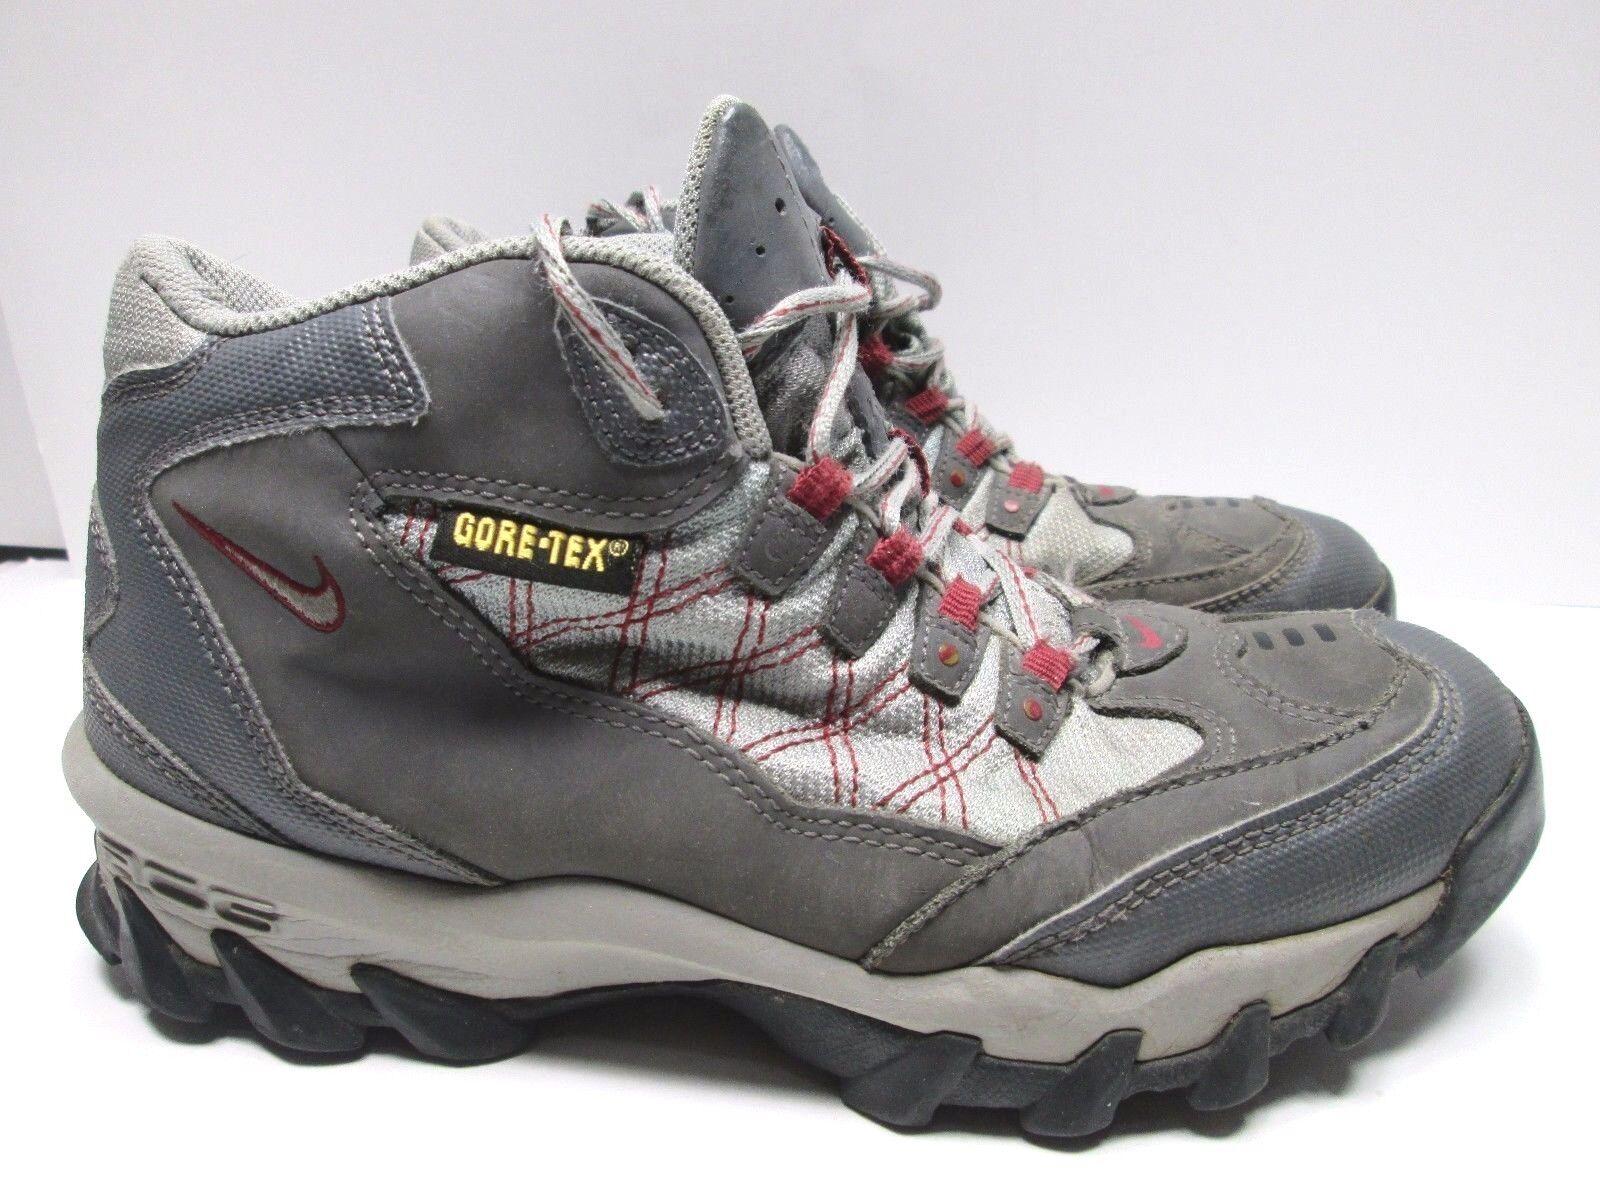 NIKE ACG Tengu Mid Gore-Tex Ankle Boots Gray  WOMENS 8 Hiking Trail